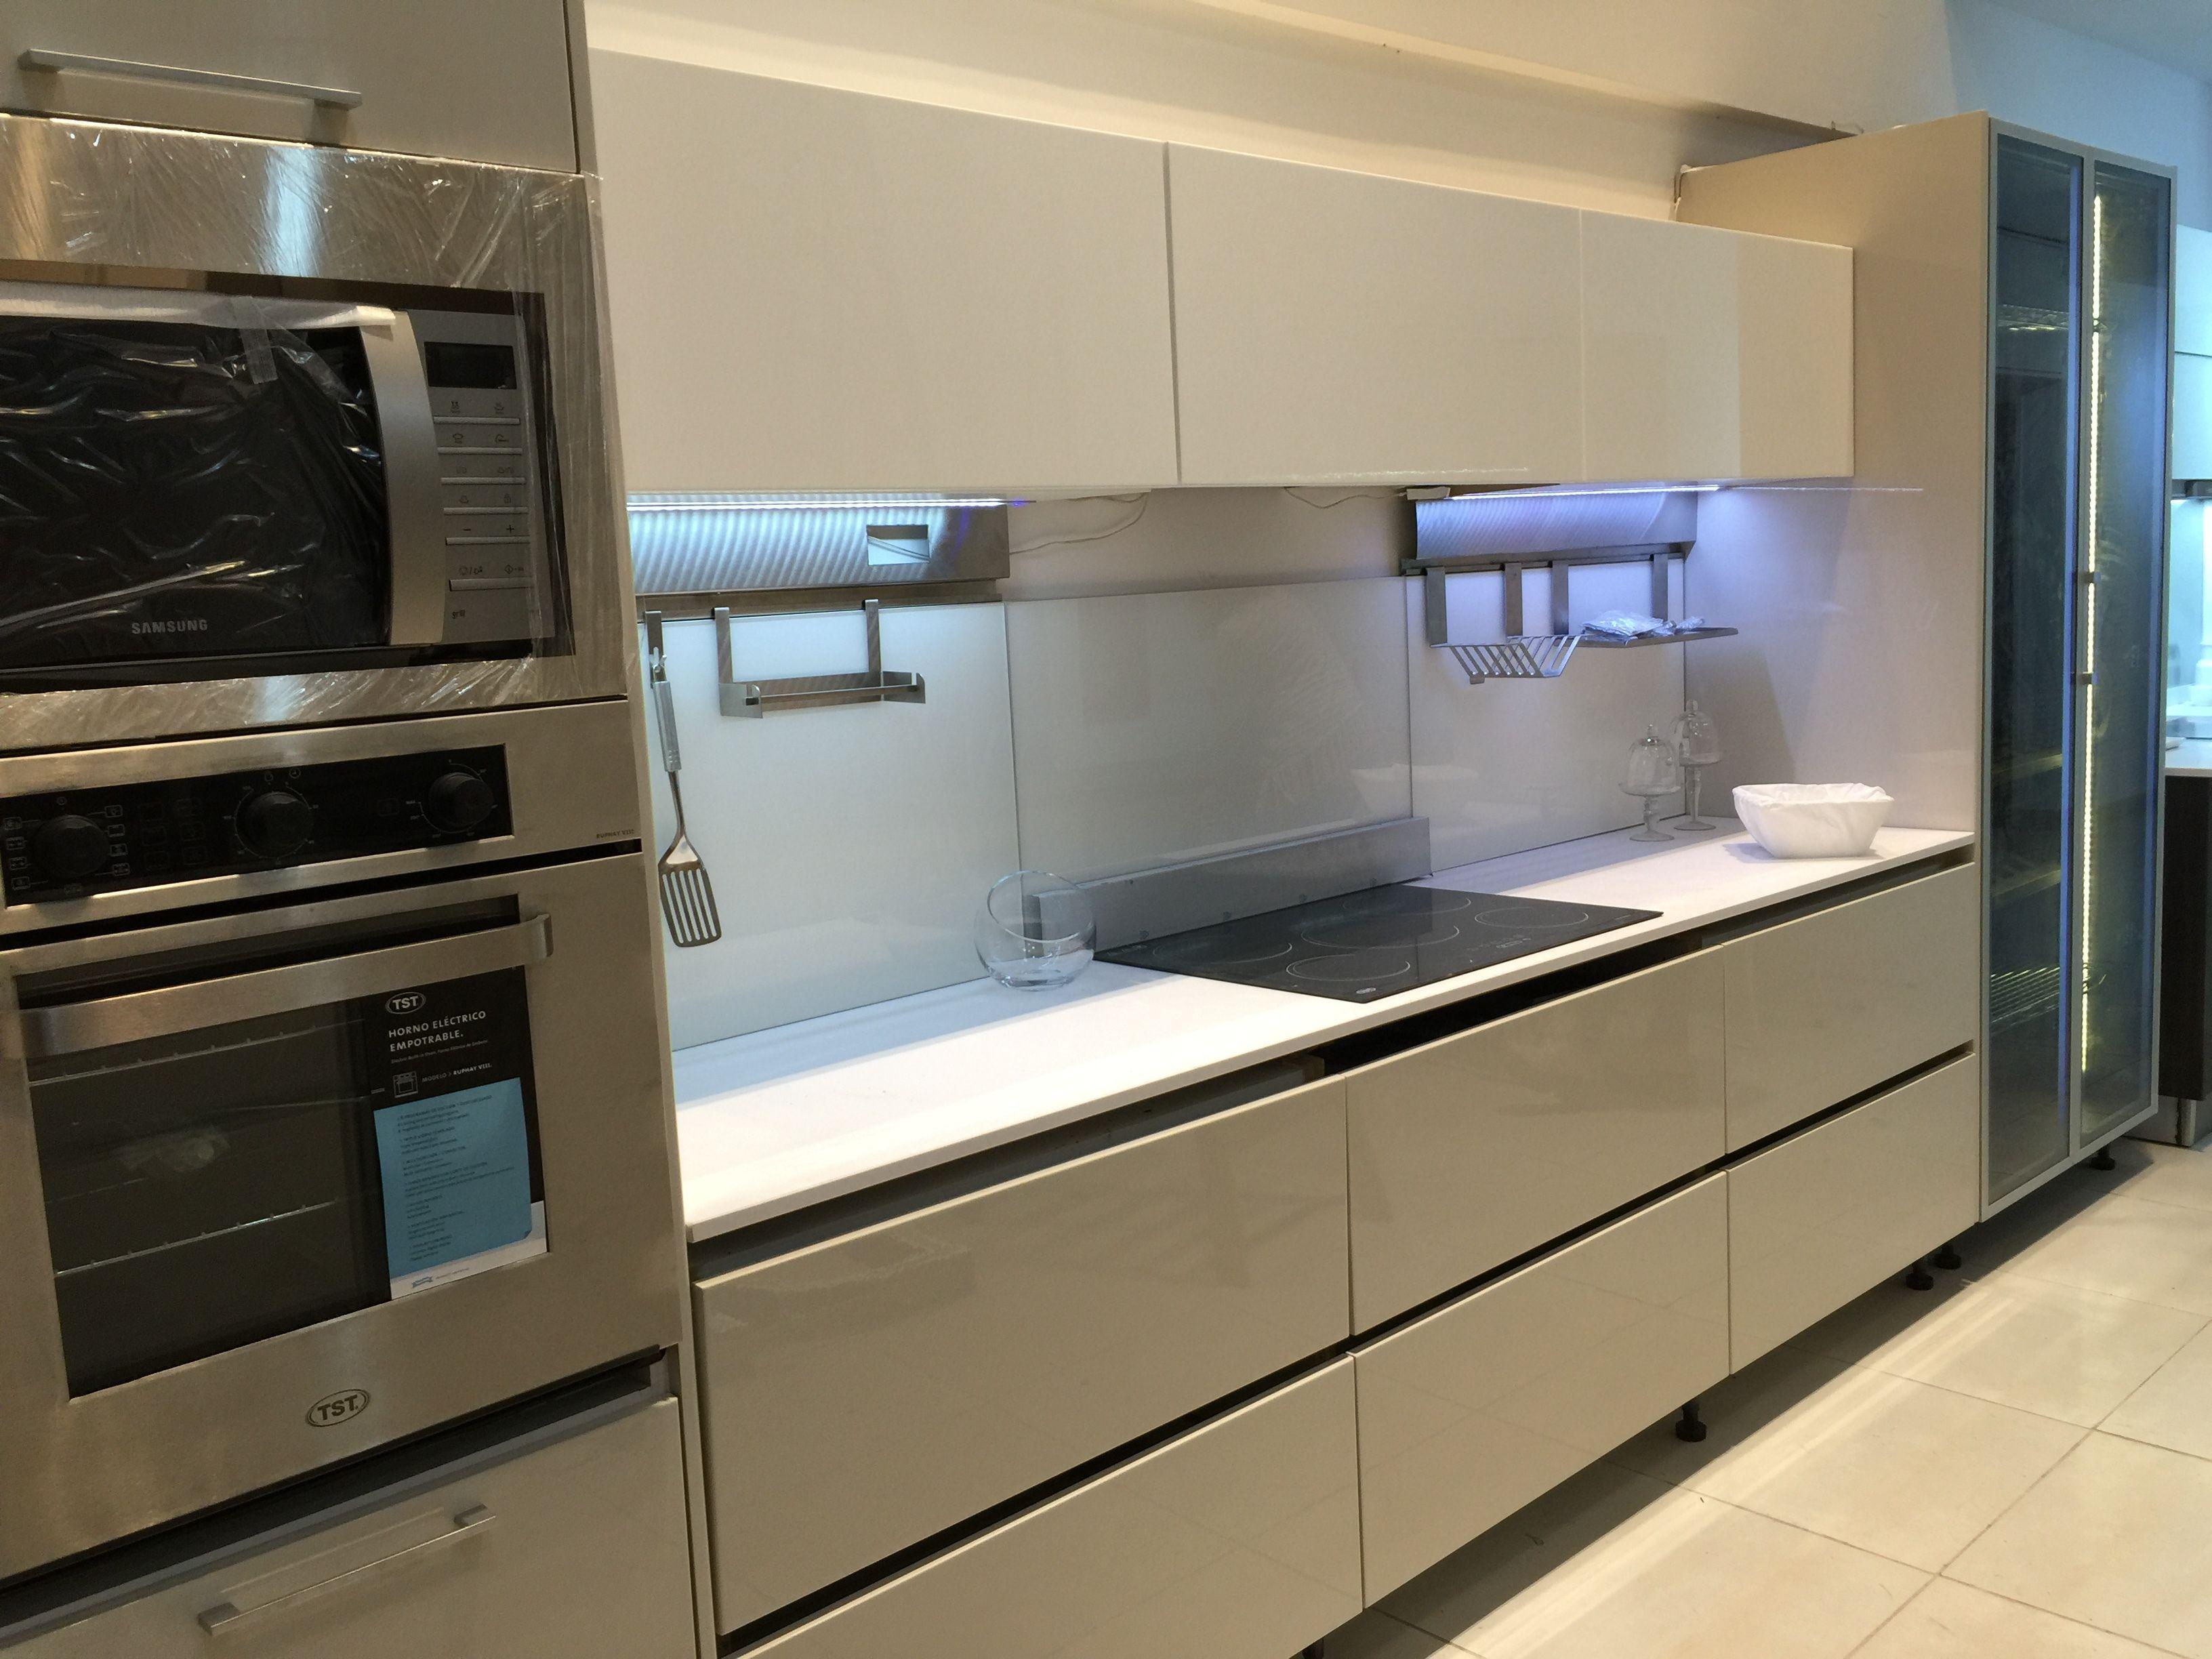 L Nea Continental En El Showroom De N Ez Cocinas L Nea  # Muebles Generacion